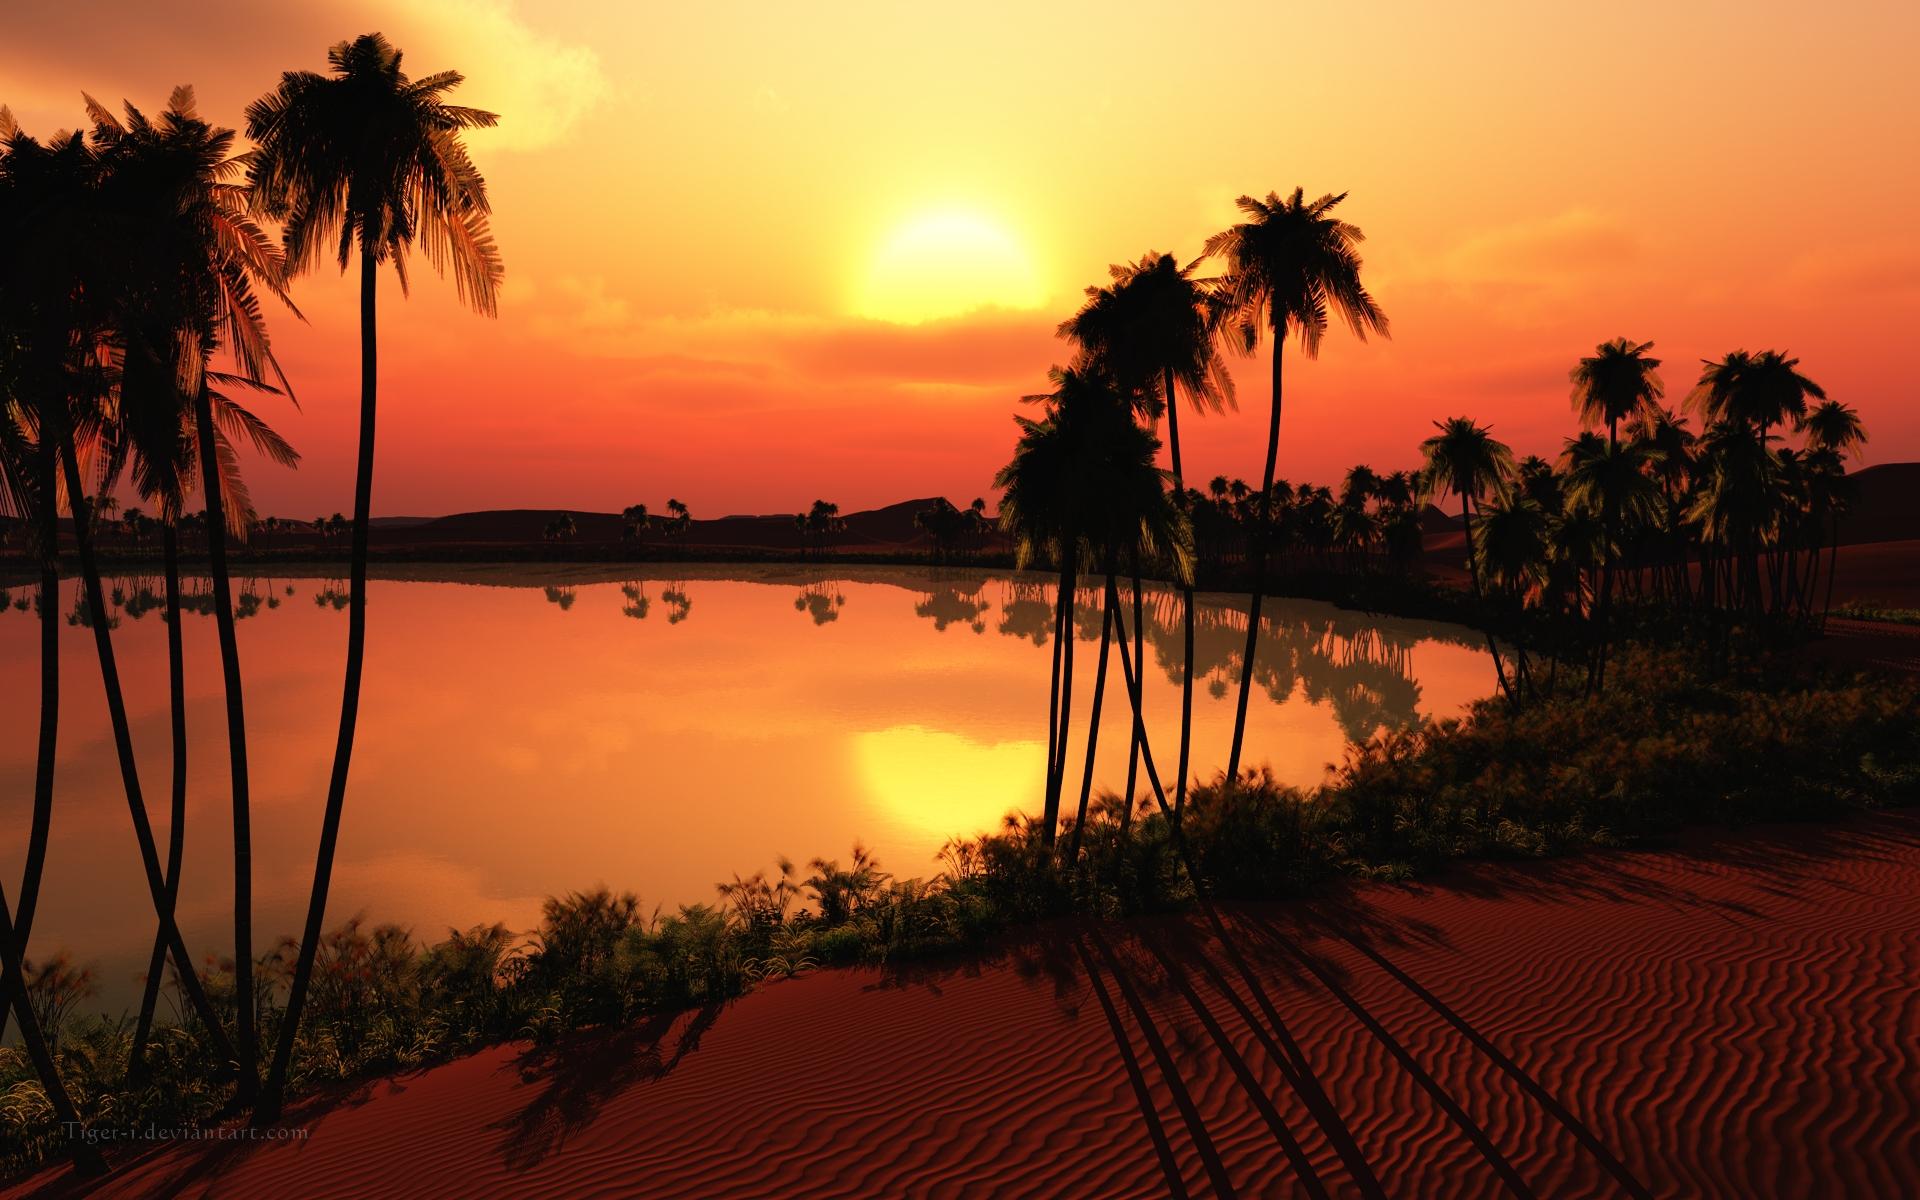 Oasis Sonnenuntergang Hintergrundbilder Oasis Sonnenuntergang frei 1920x1200